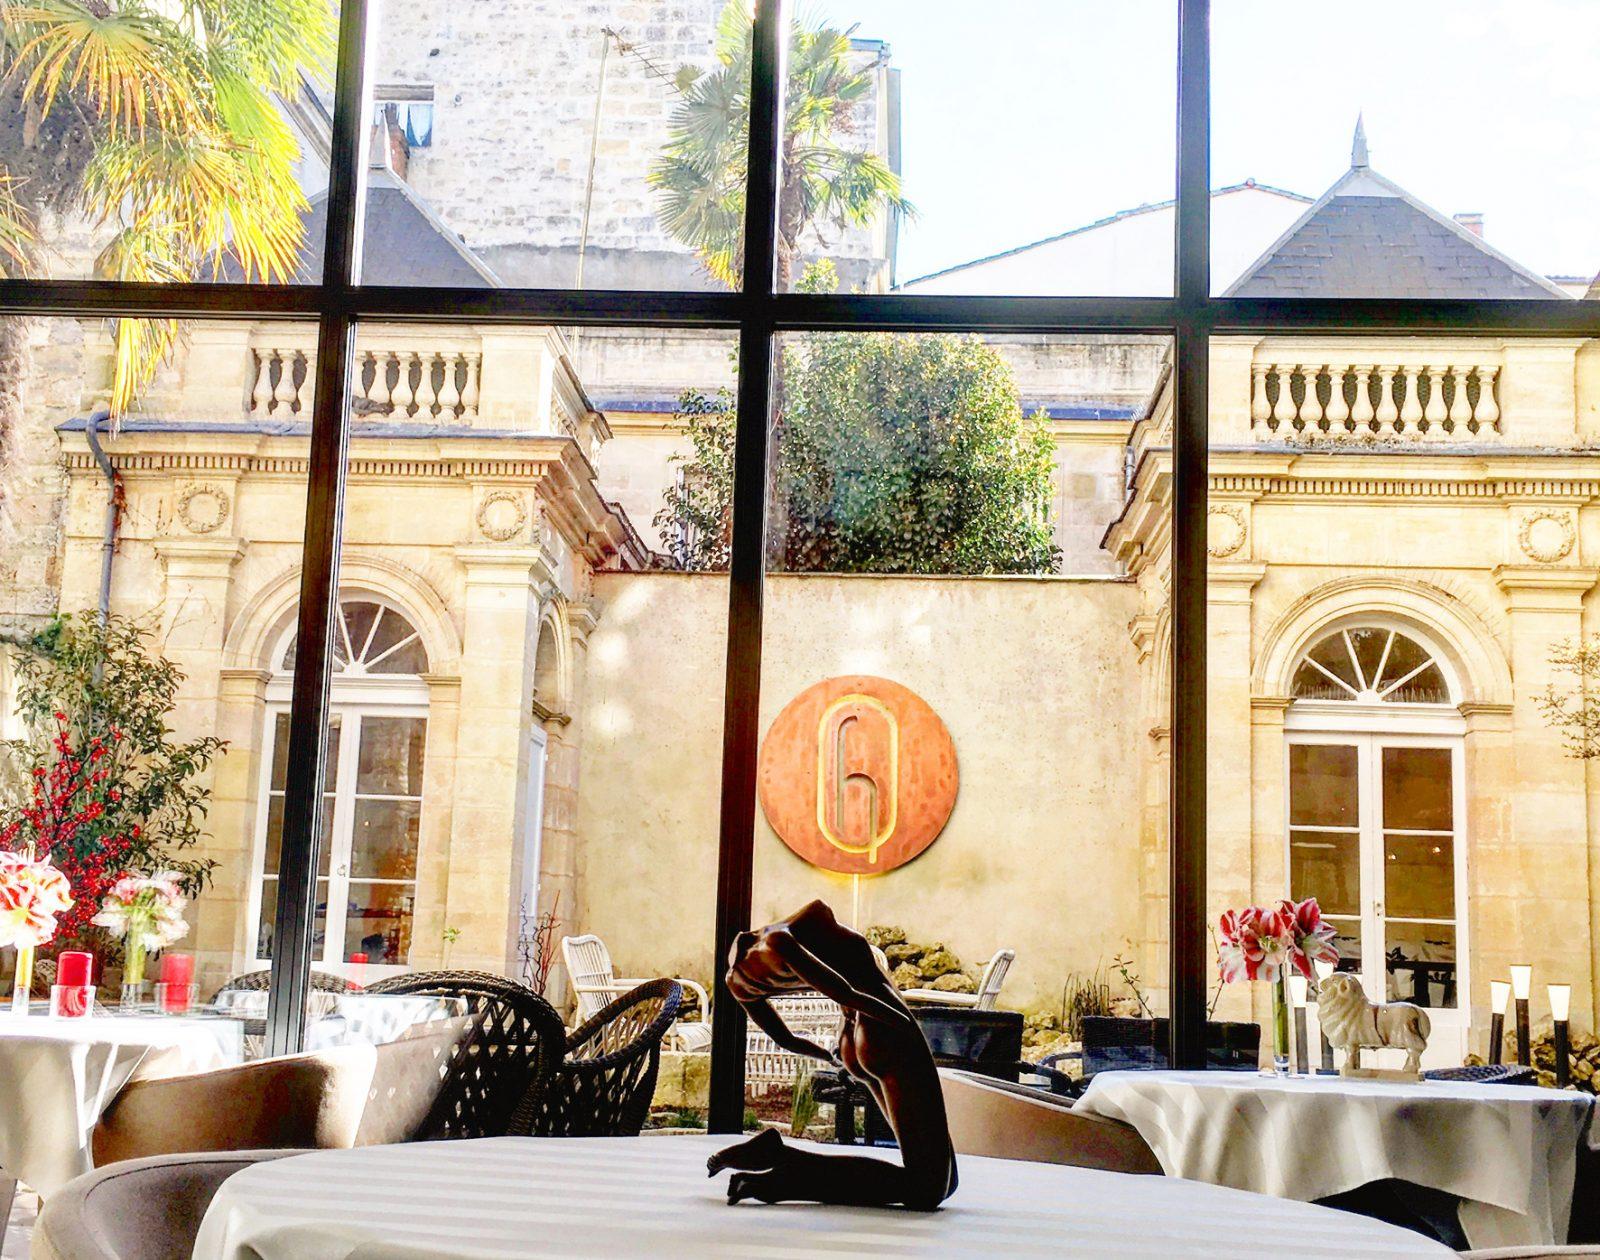 Hotel-Quinconces -salle-Lemaire-hebdo-vin-chine